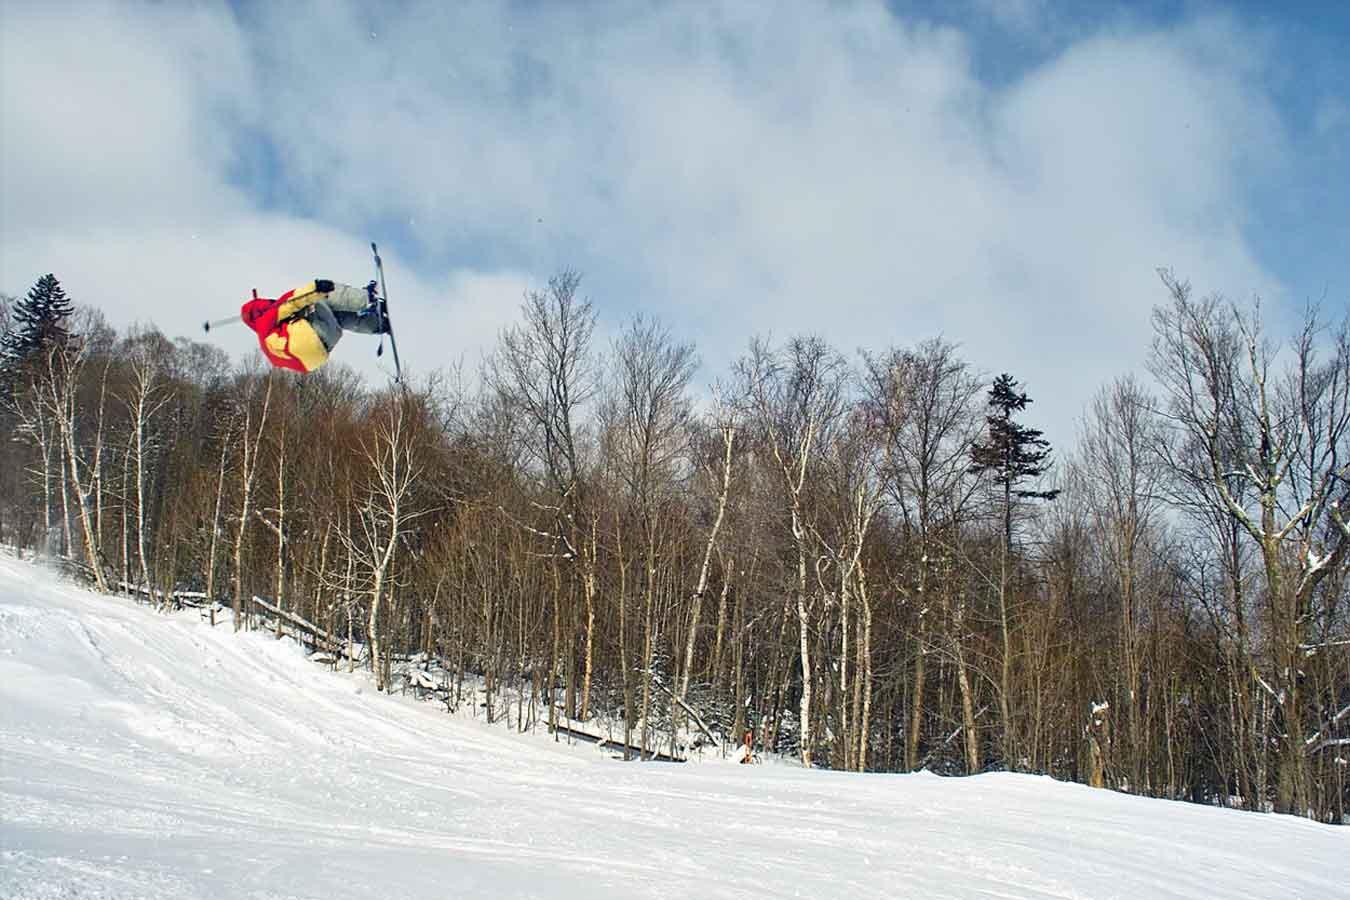 cork 7 at Mt. Snow